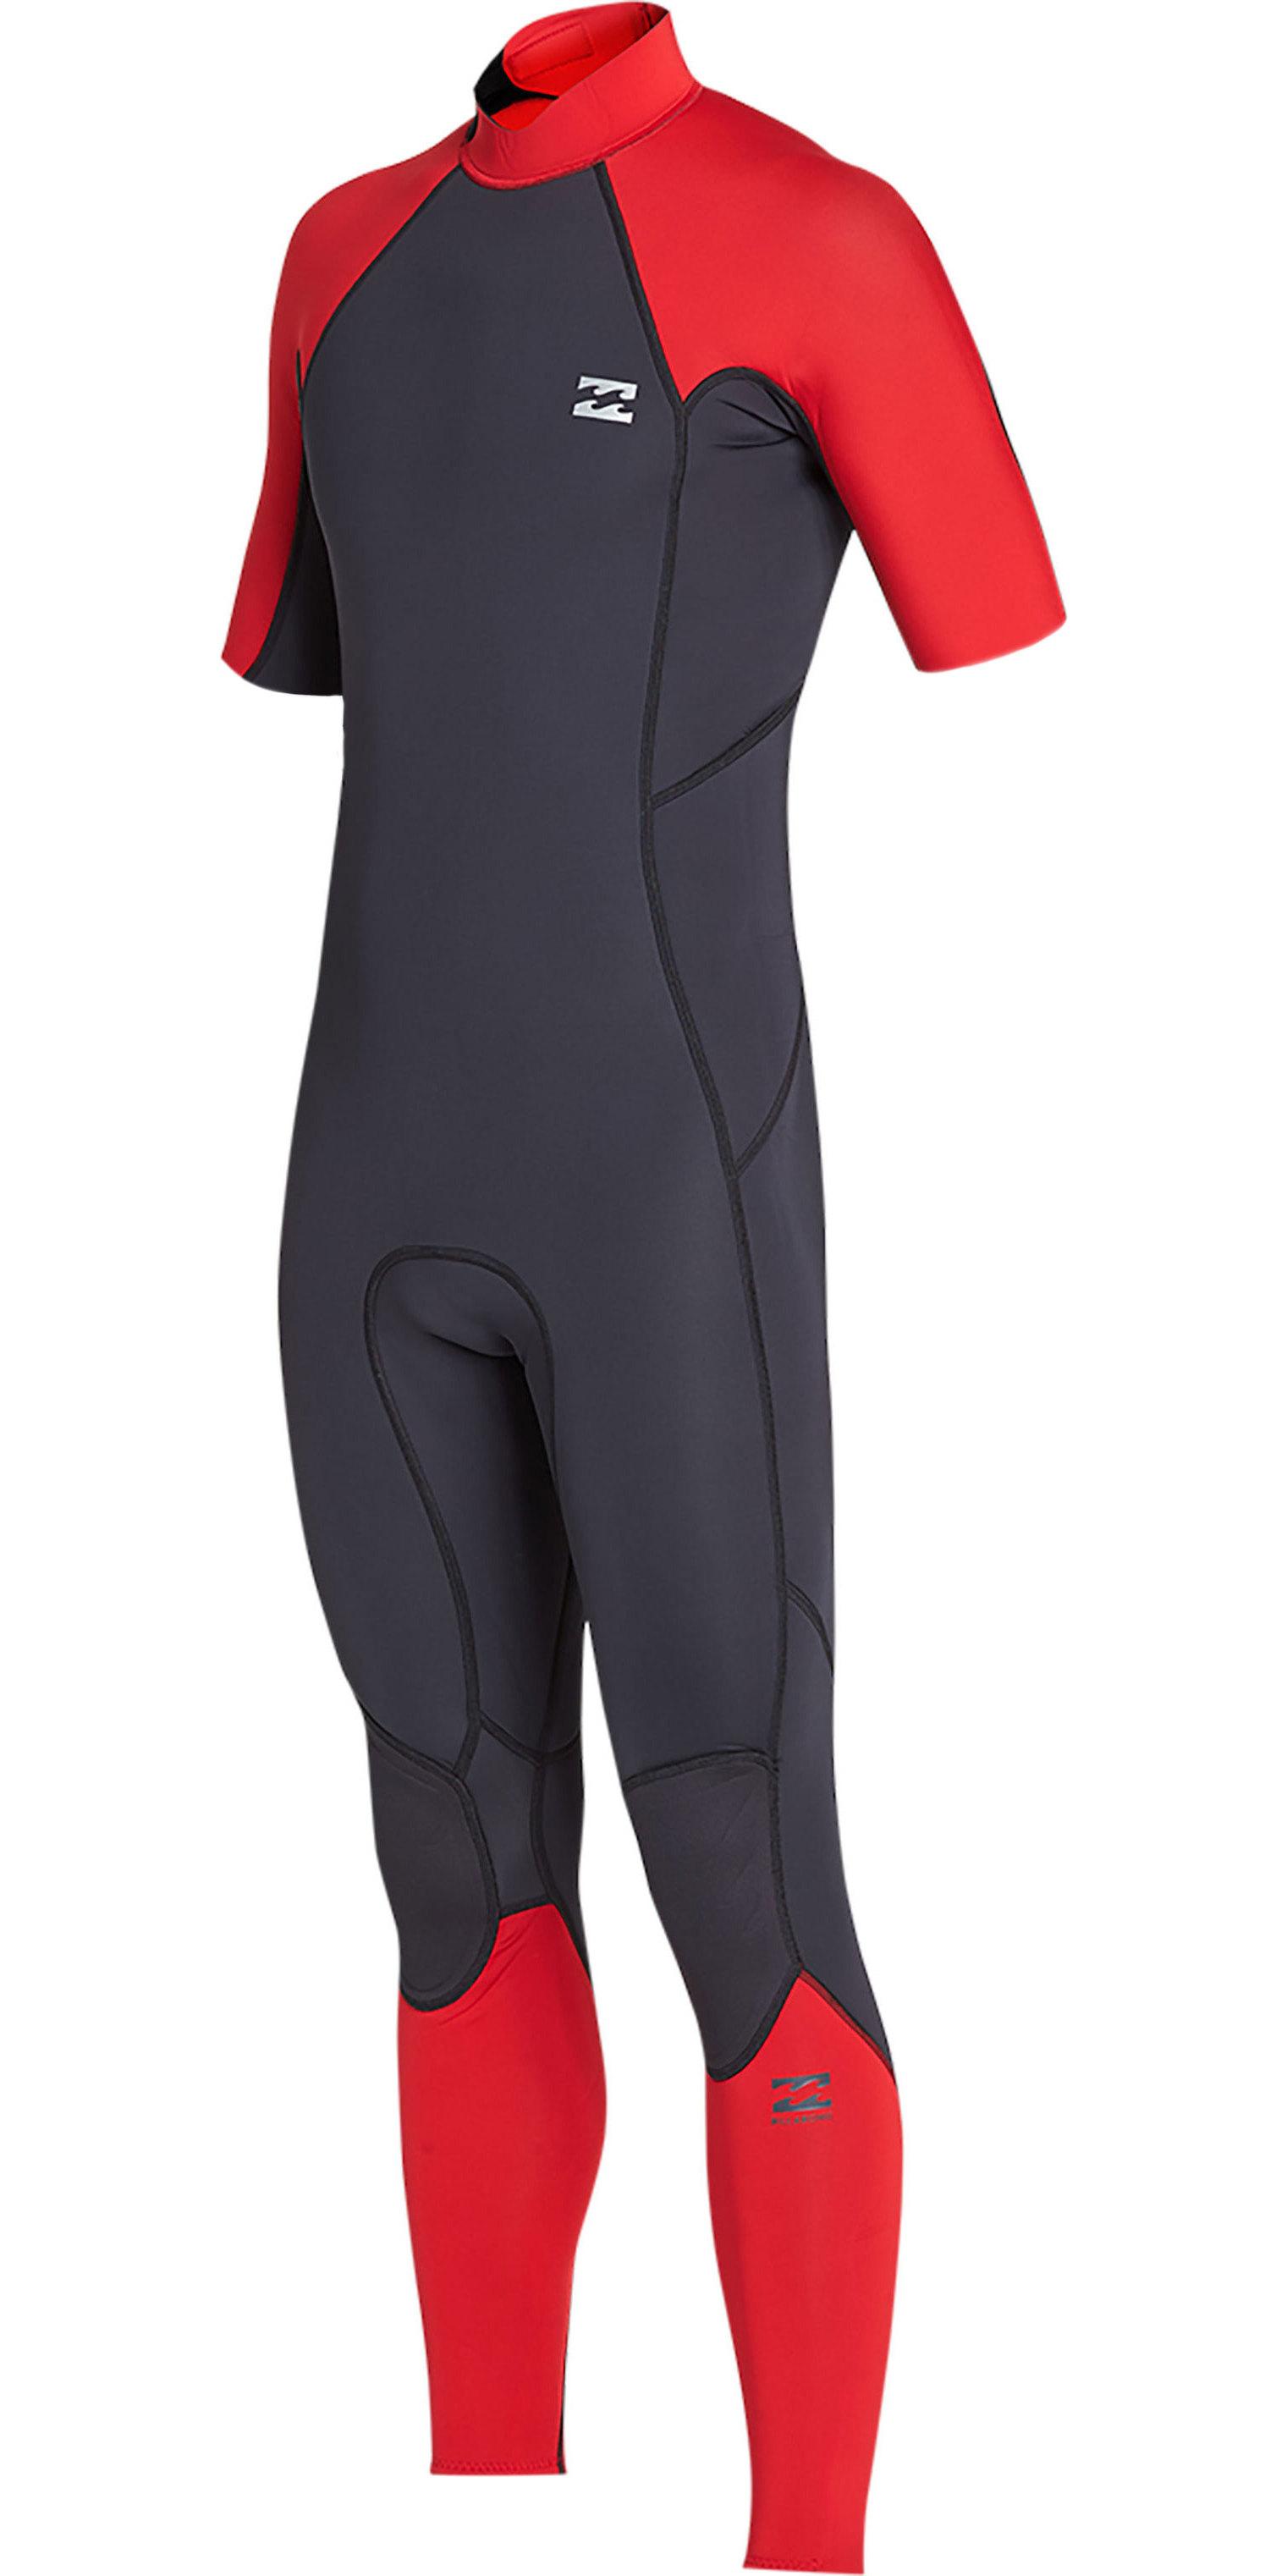 1d63038b9059 2019 Billabong Mens 2mm Furnace Absolute Back Zip Short Sleeve Wetsuit Red  N42m29 - Mens | Wetsuit Outlet